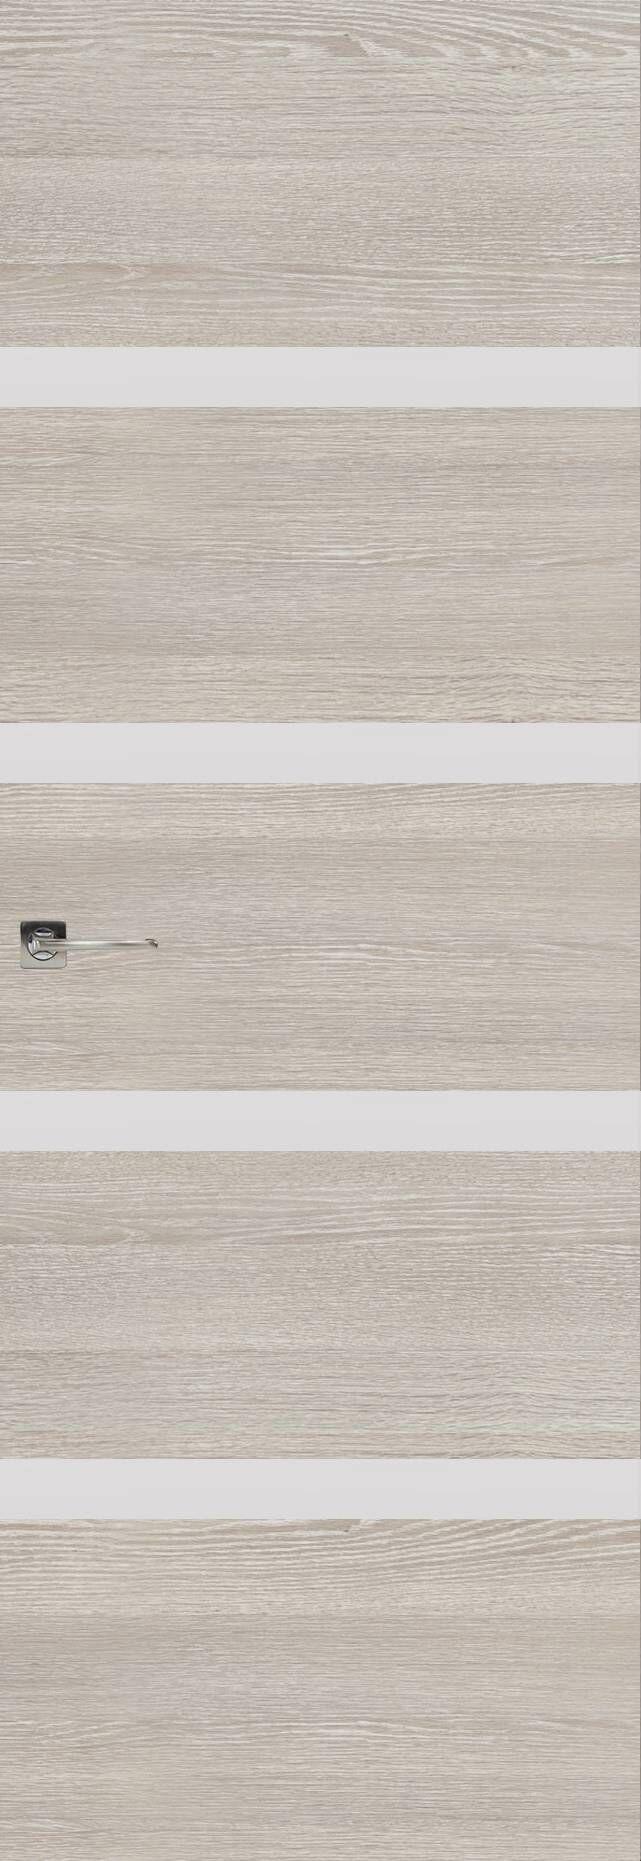 Tivoli Д-4 Invisible цвет - Серый дуб Без стекла (ДГ)